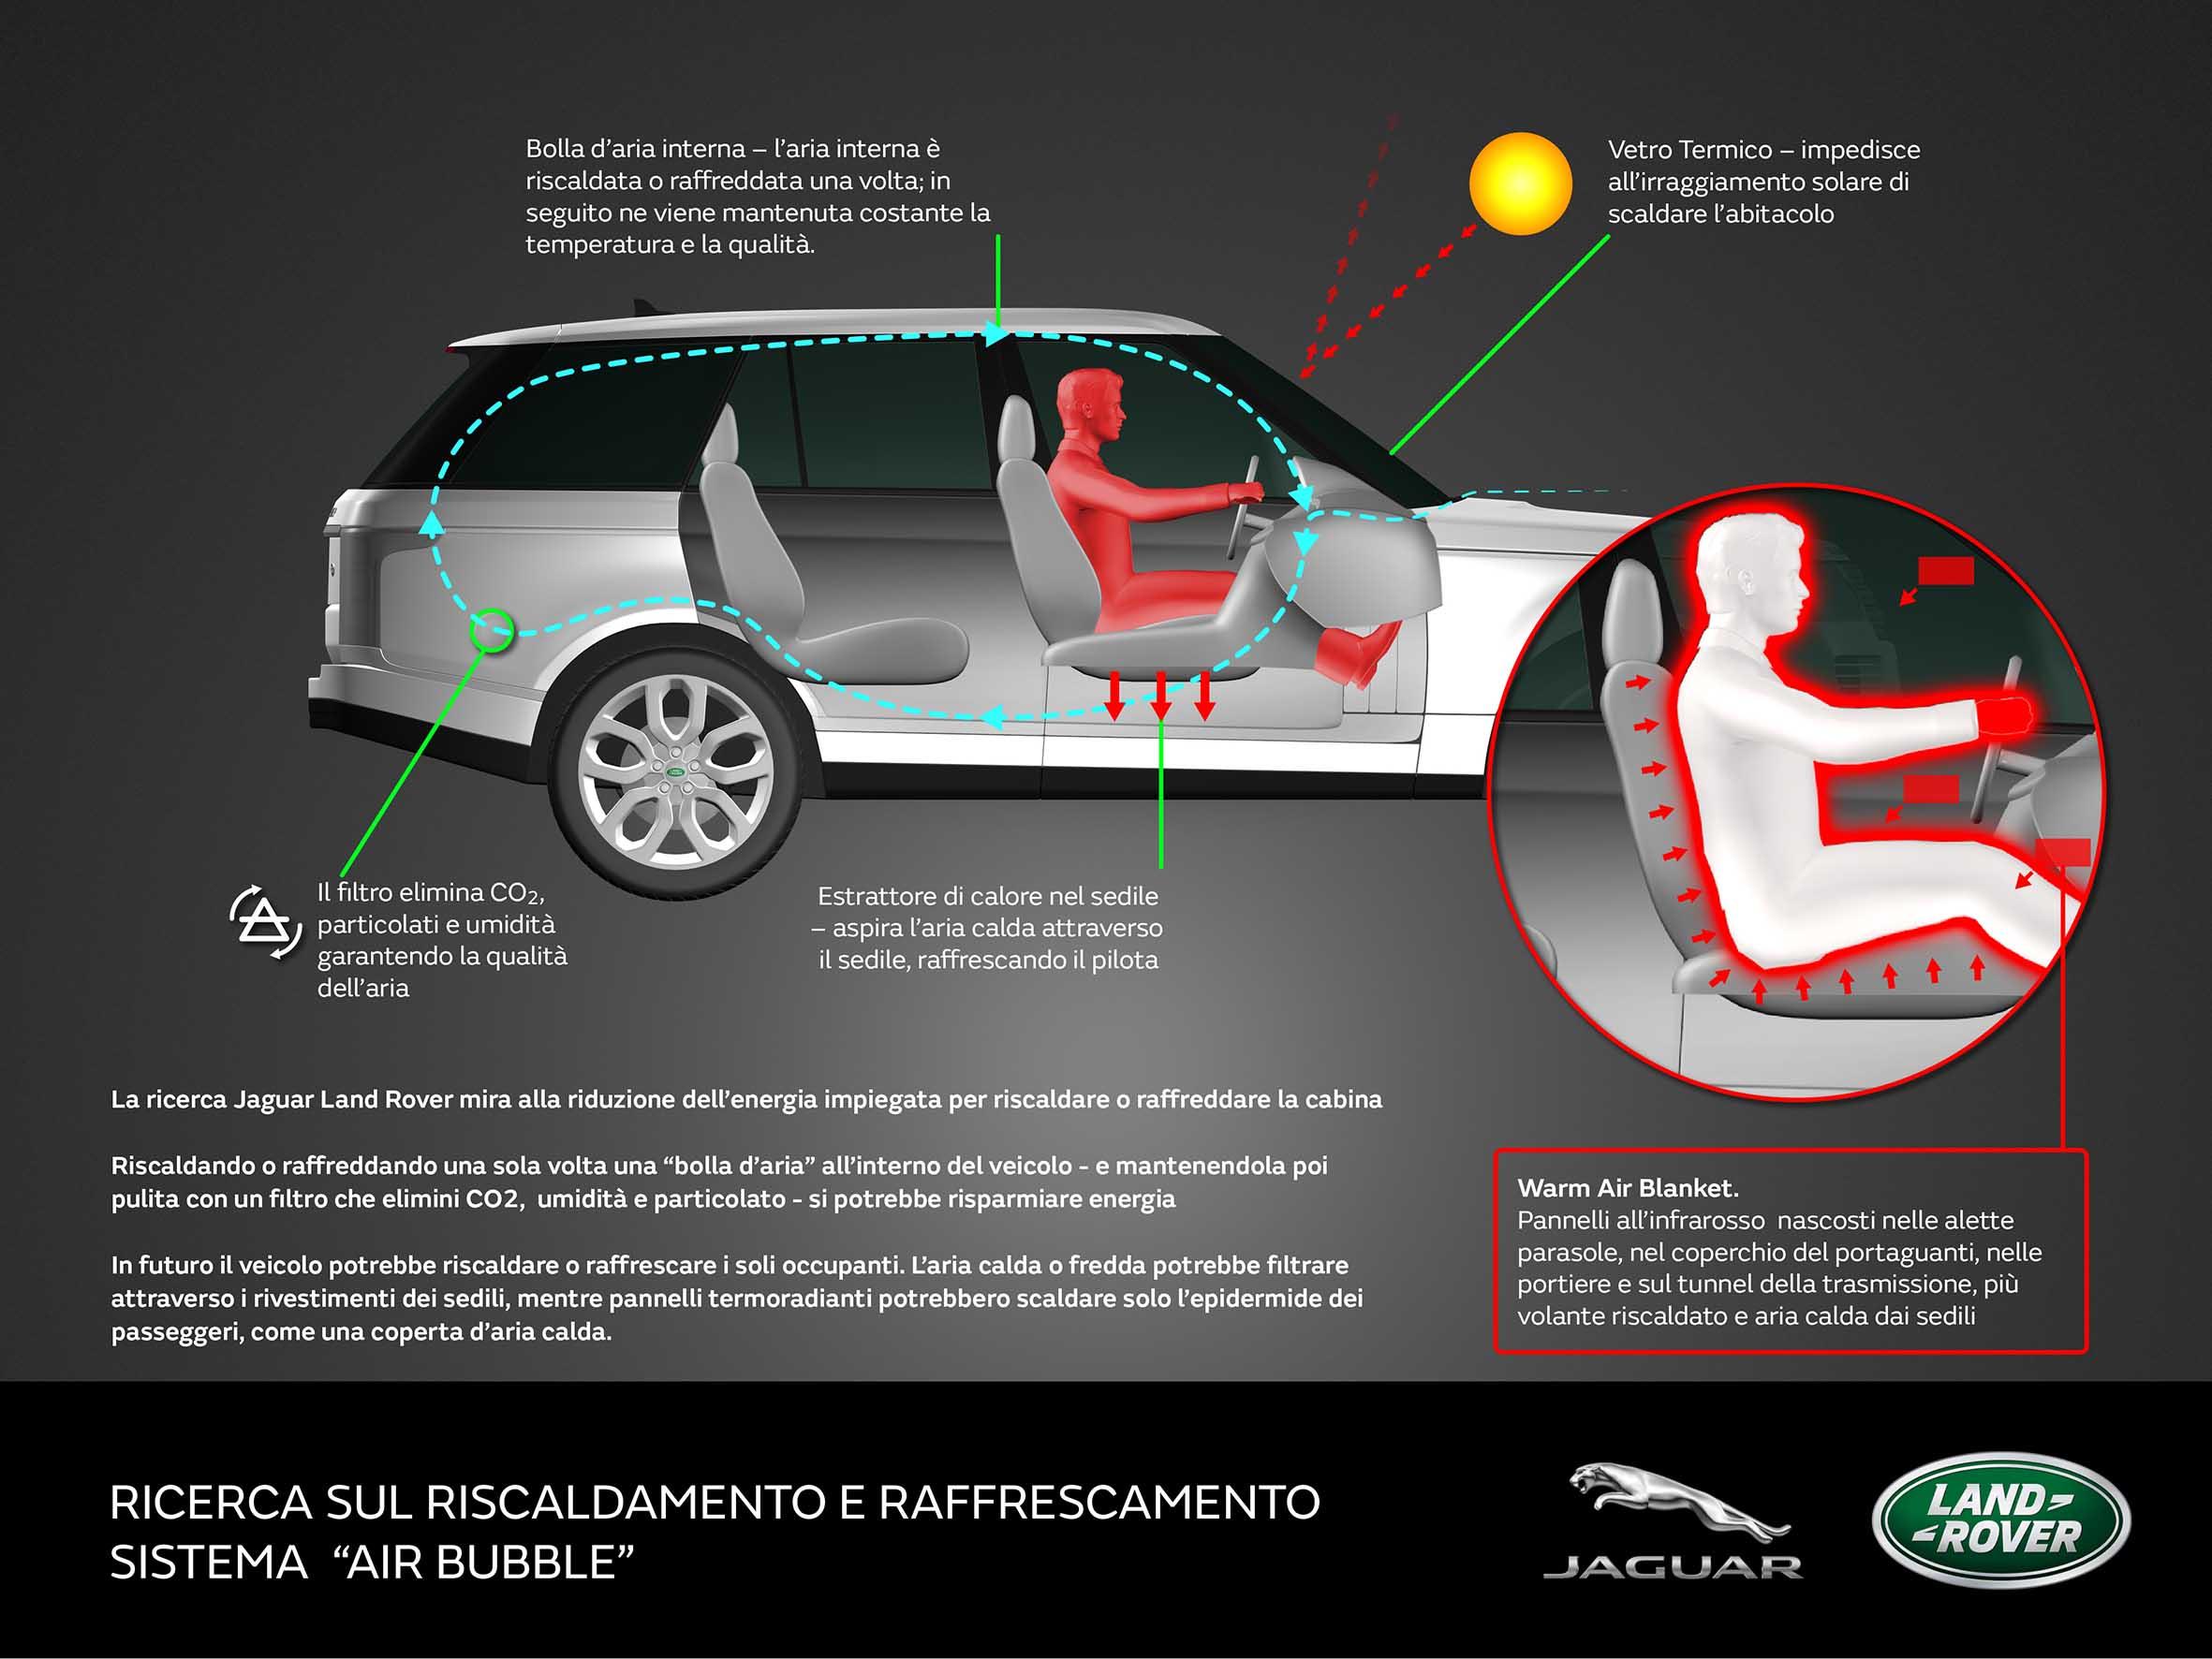 Jaguar Land Rover - Warm Air Blanket